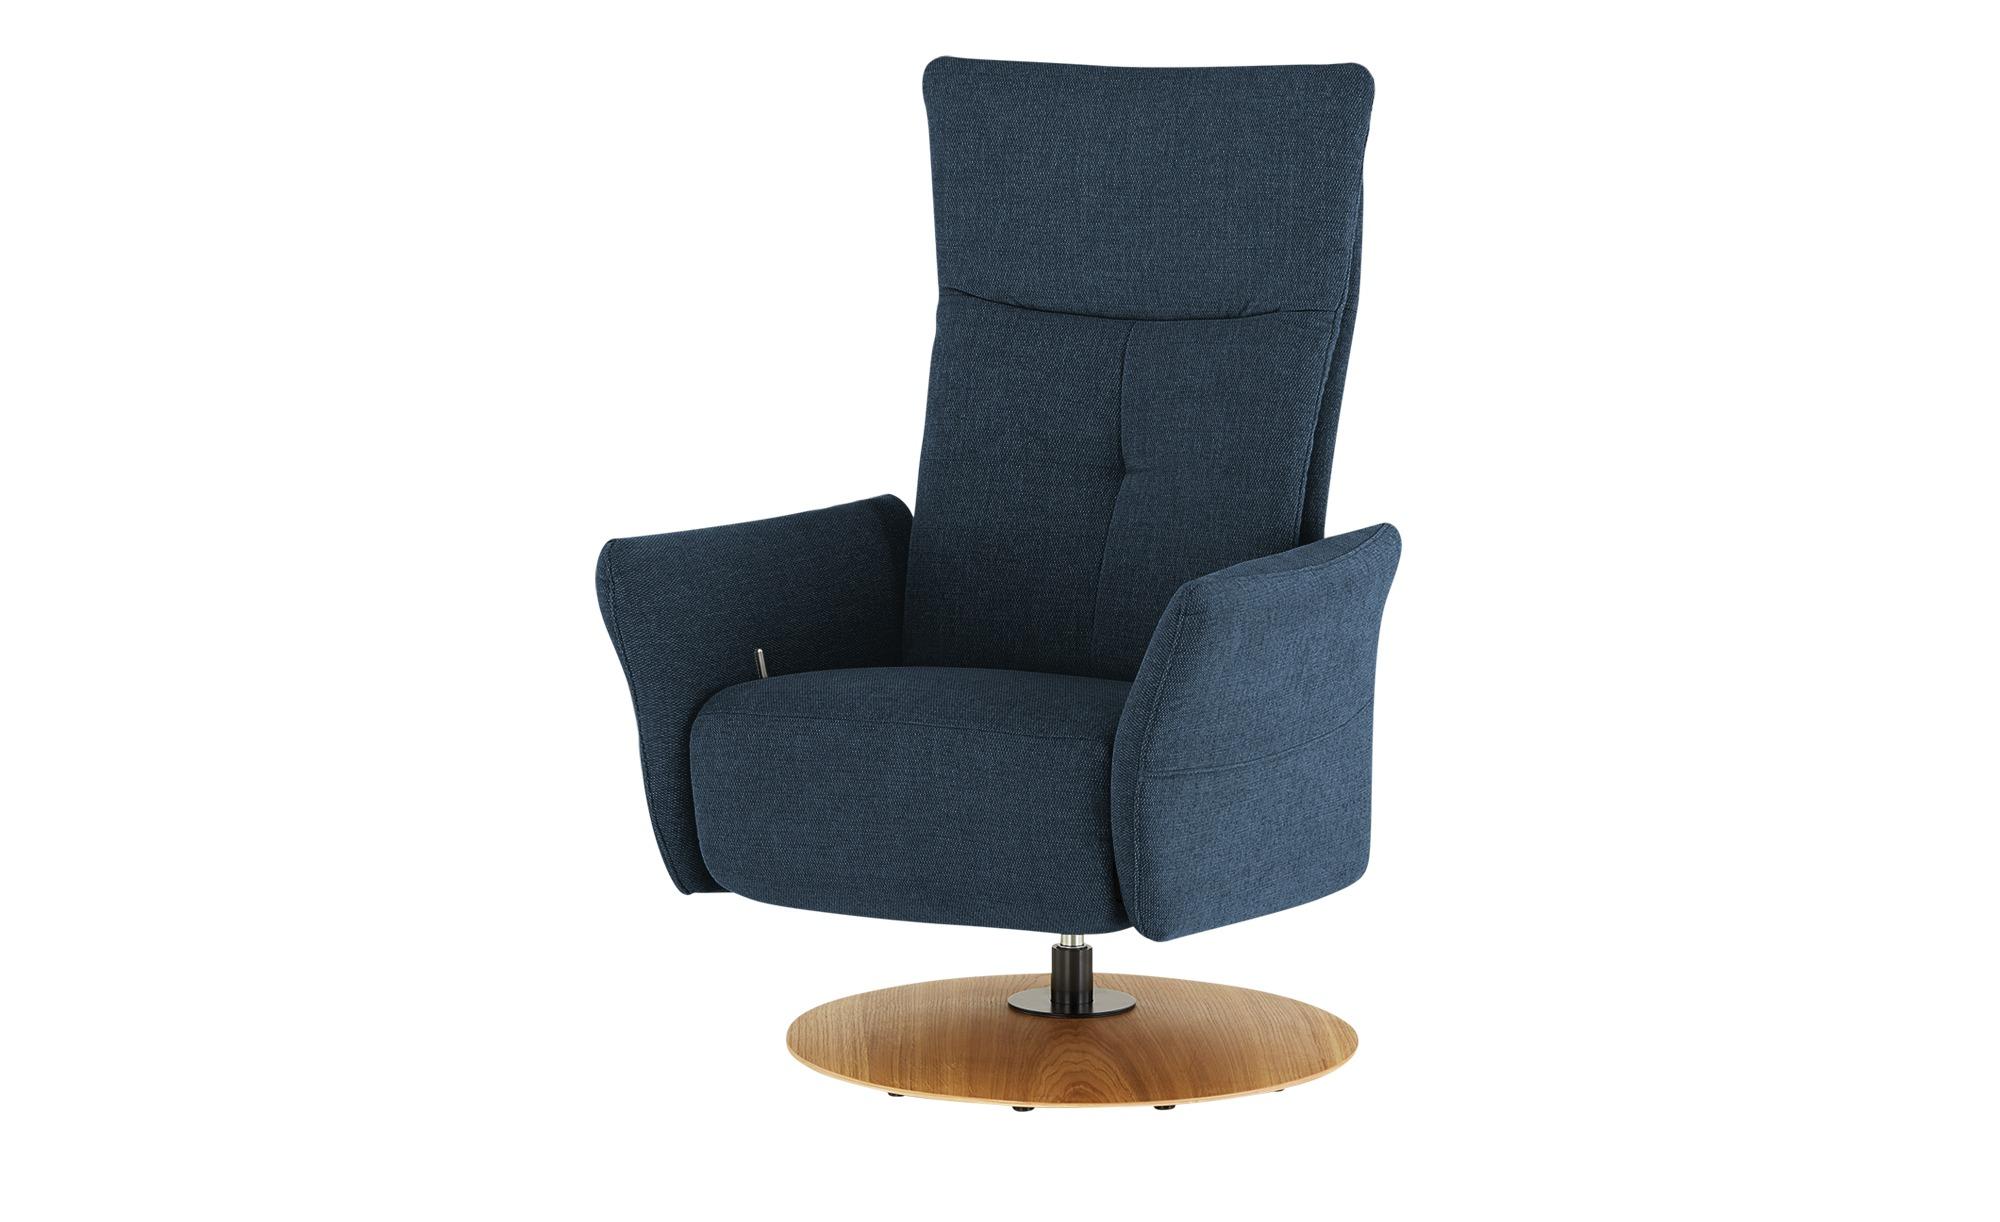 Wohnwert Funktionssessel  Katja ¦ blau ¦ Maße (cm): B: 79 H: 114 T: 80 Polstermöbel > Sessel > Drehsessel - Höffner